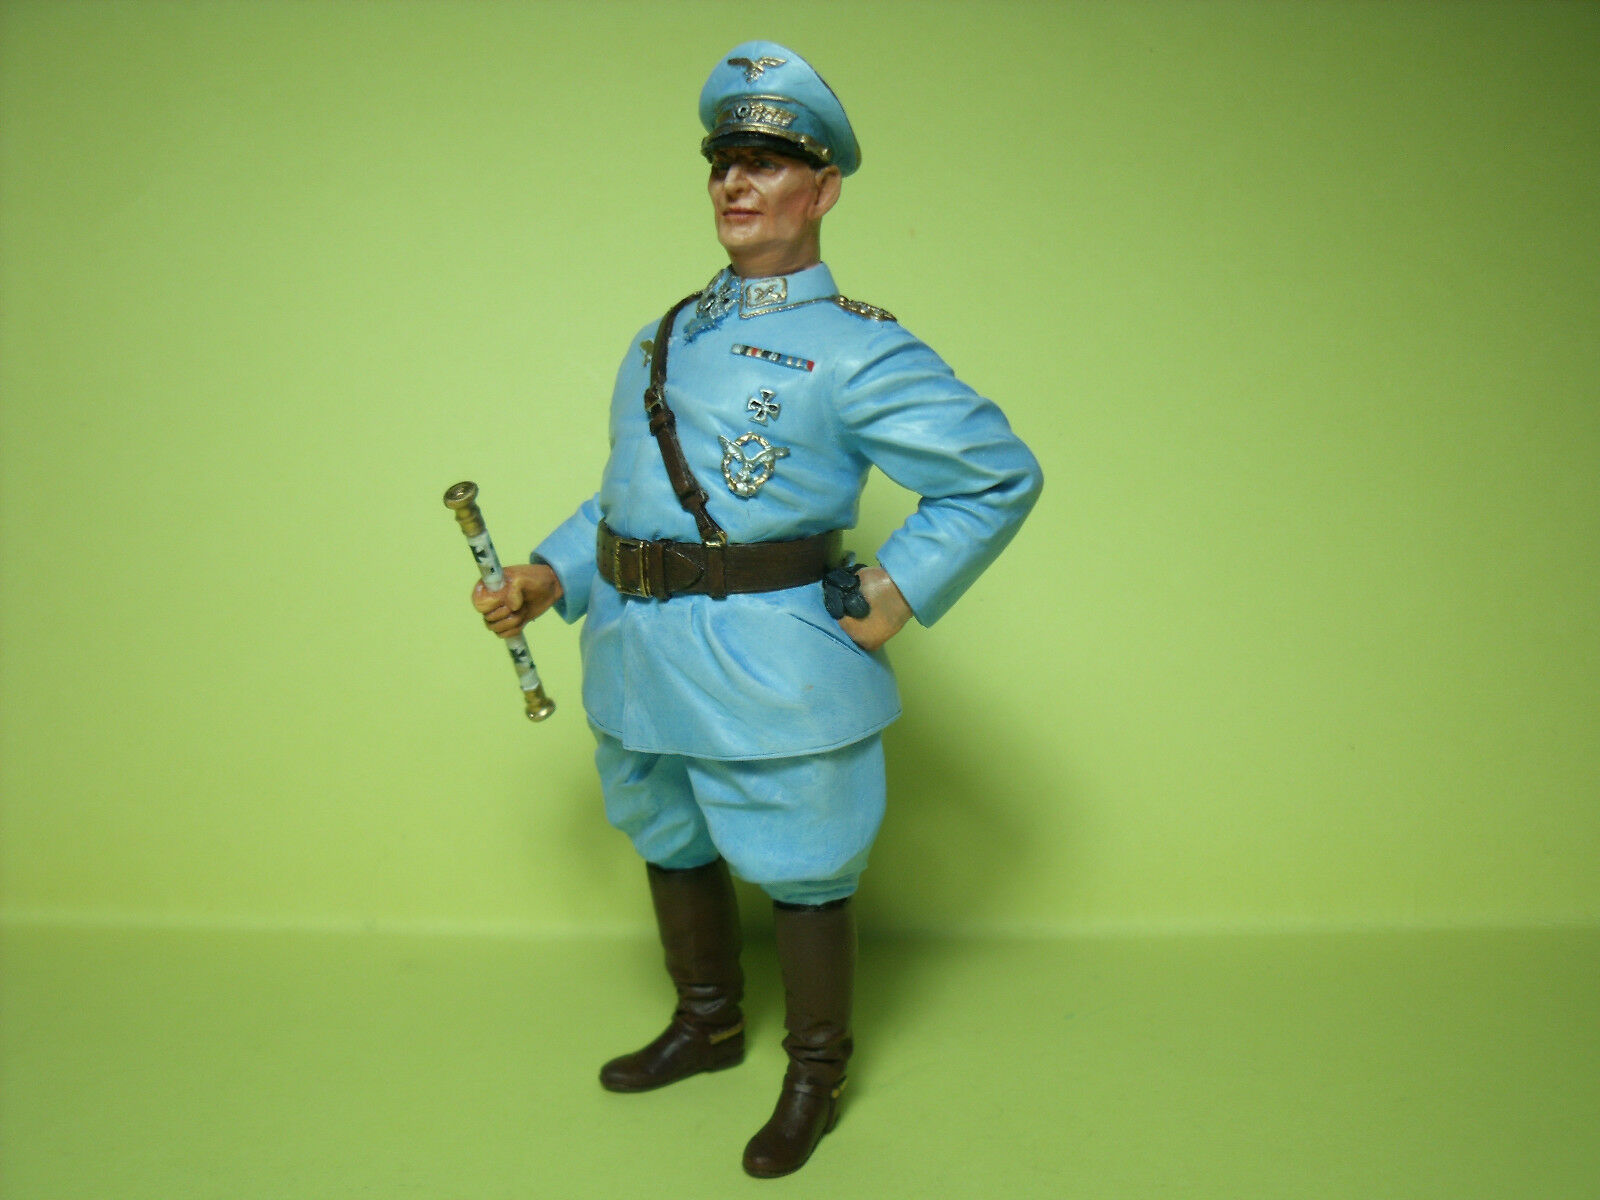 Alemán Mariscal Goering Guerra Mundial 2 figura pintada por Vroom